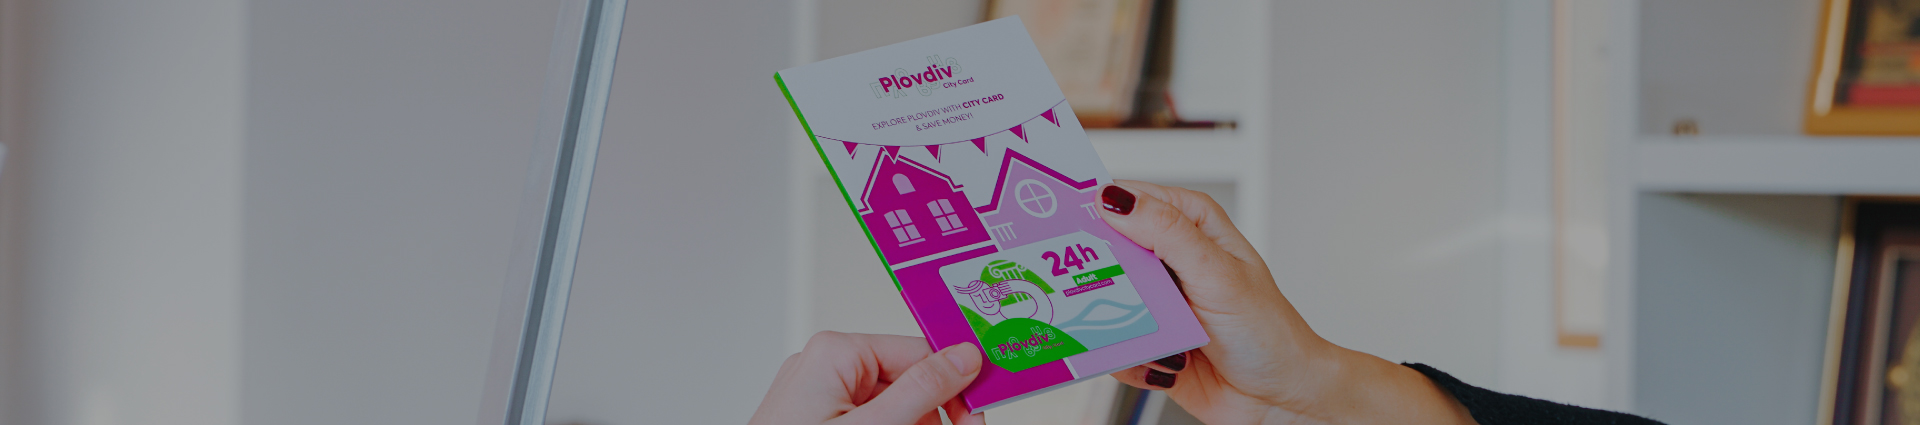 buy-plovdiv-city-card